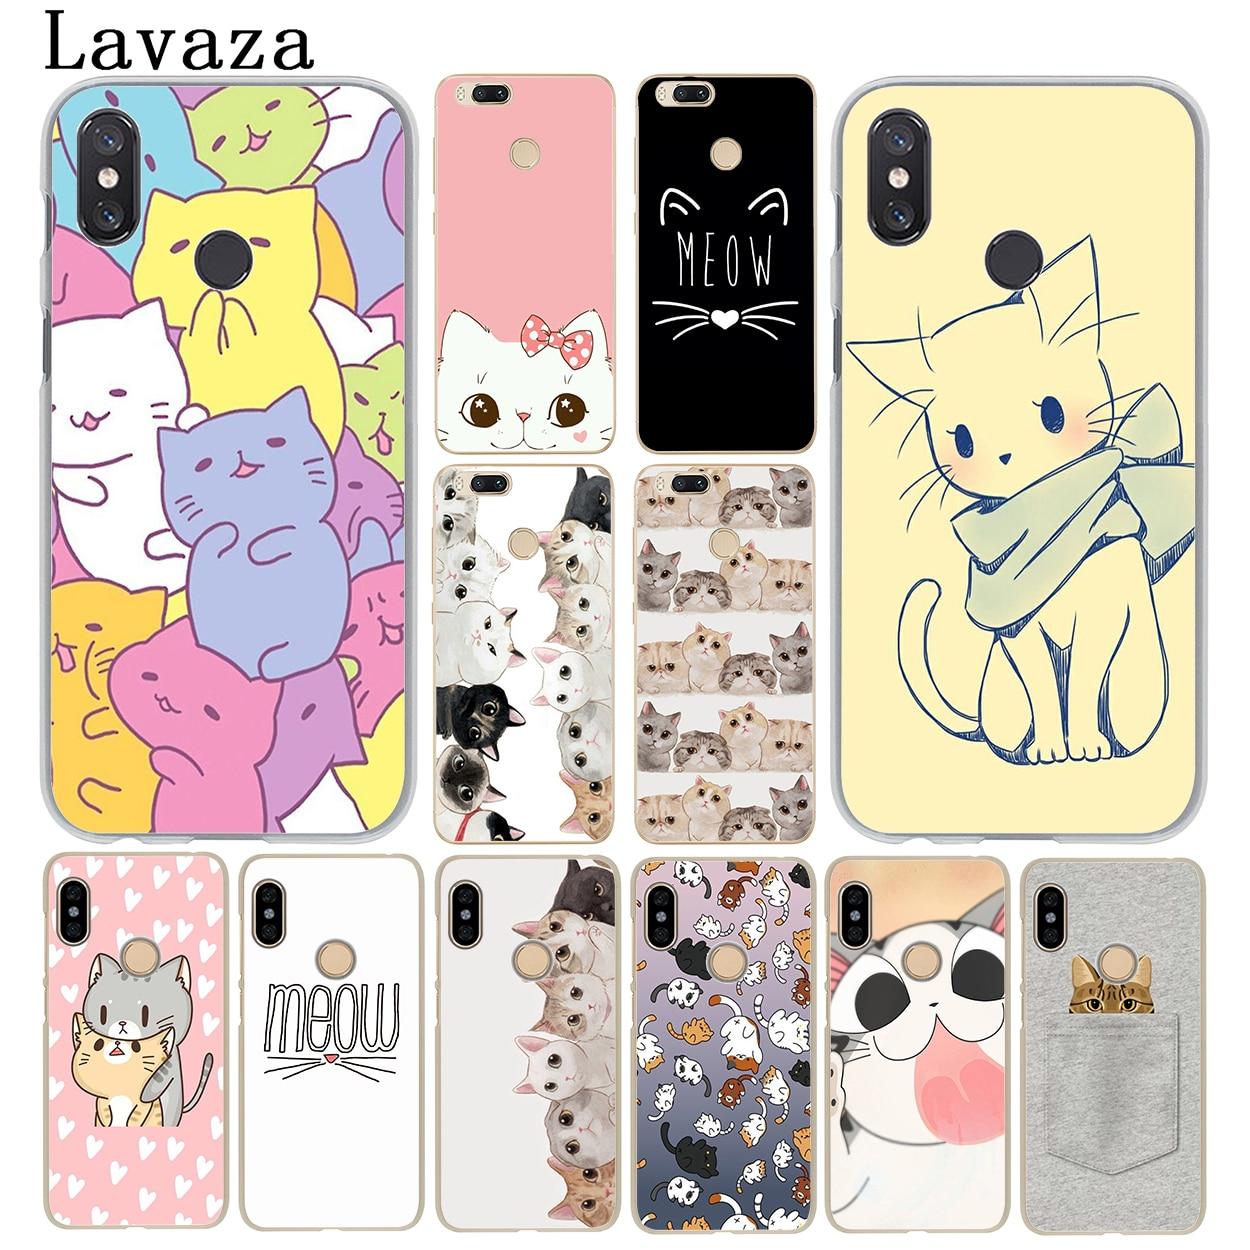 Lavaza lindo jengibre PIZZA bowknot gato kawaii funda de teléfono para Xiaomi mi 9 9T A3 Pro CC9 CC9E 8 SE A2 Lite A1 pocophone f1 6X MAX 3